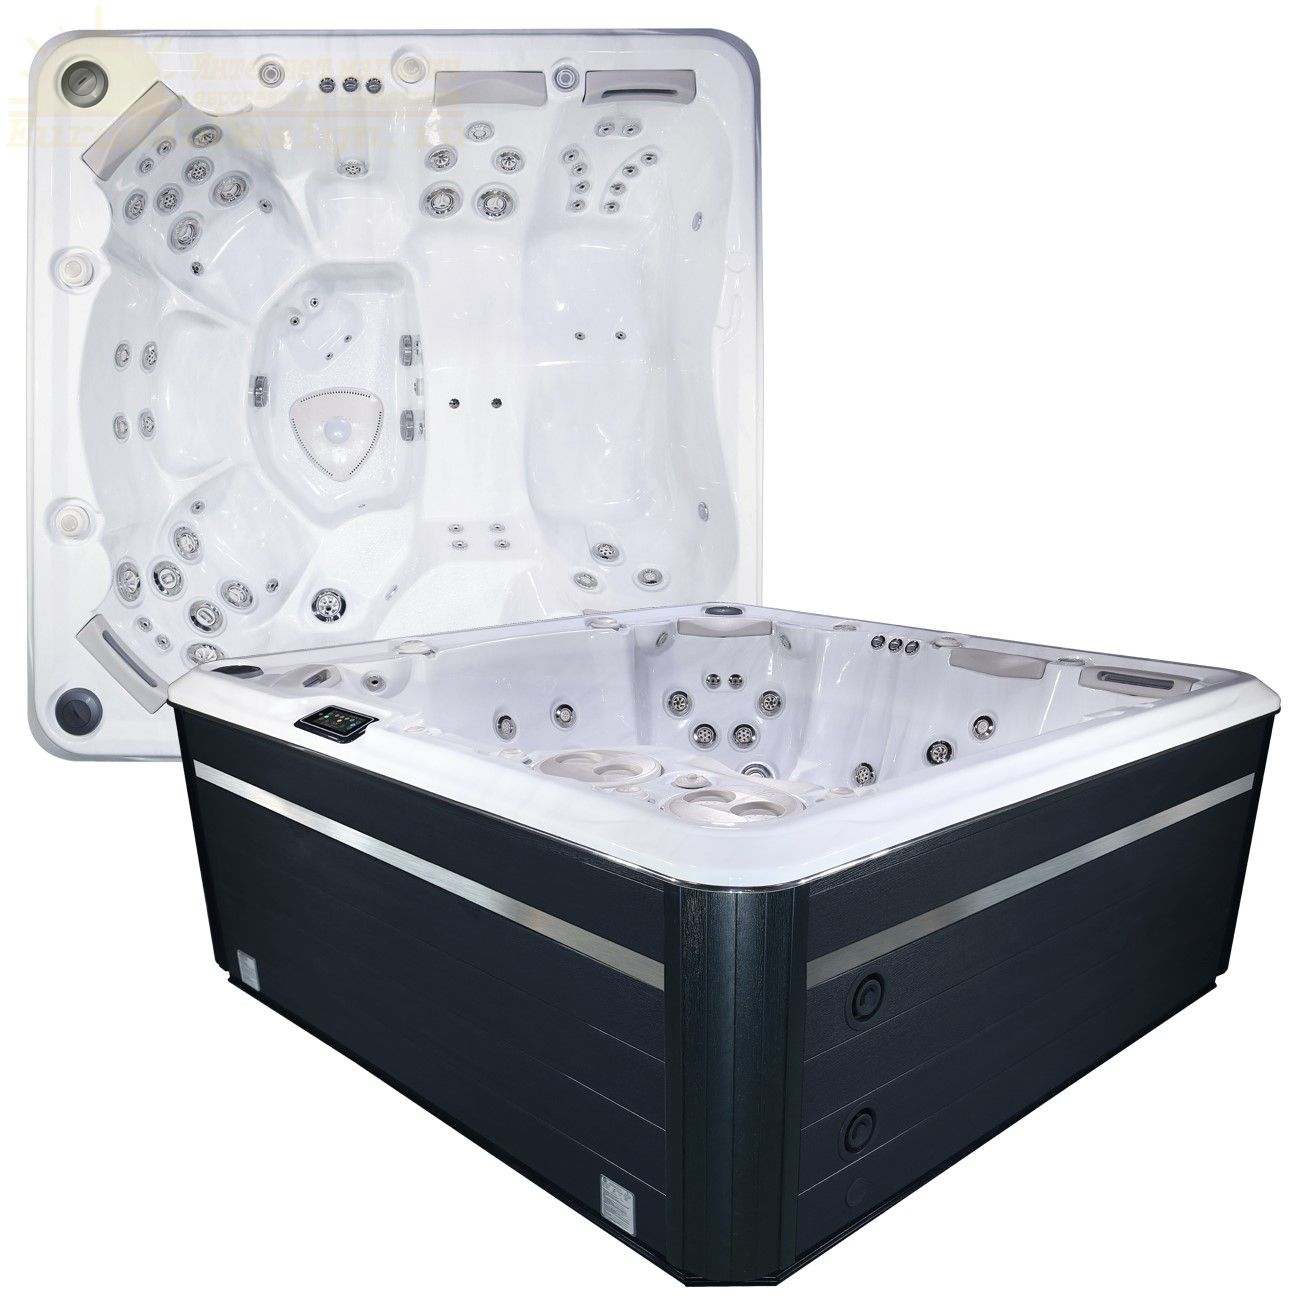 СПА бассейн Hydropool Self Cleaning 790 Platinum 60 форсунок 239х239 ФОТО